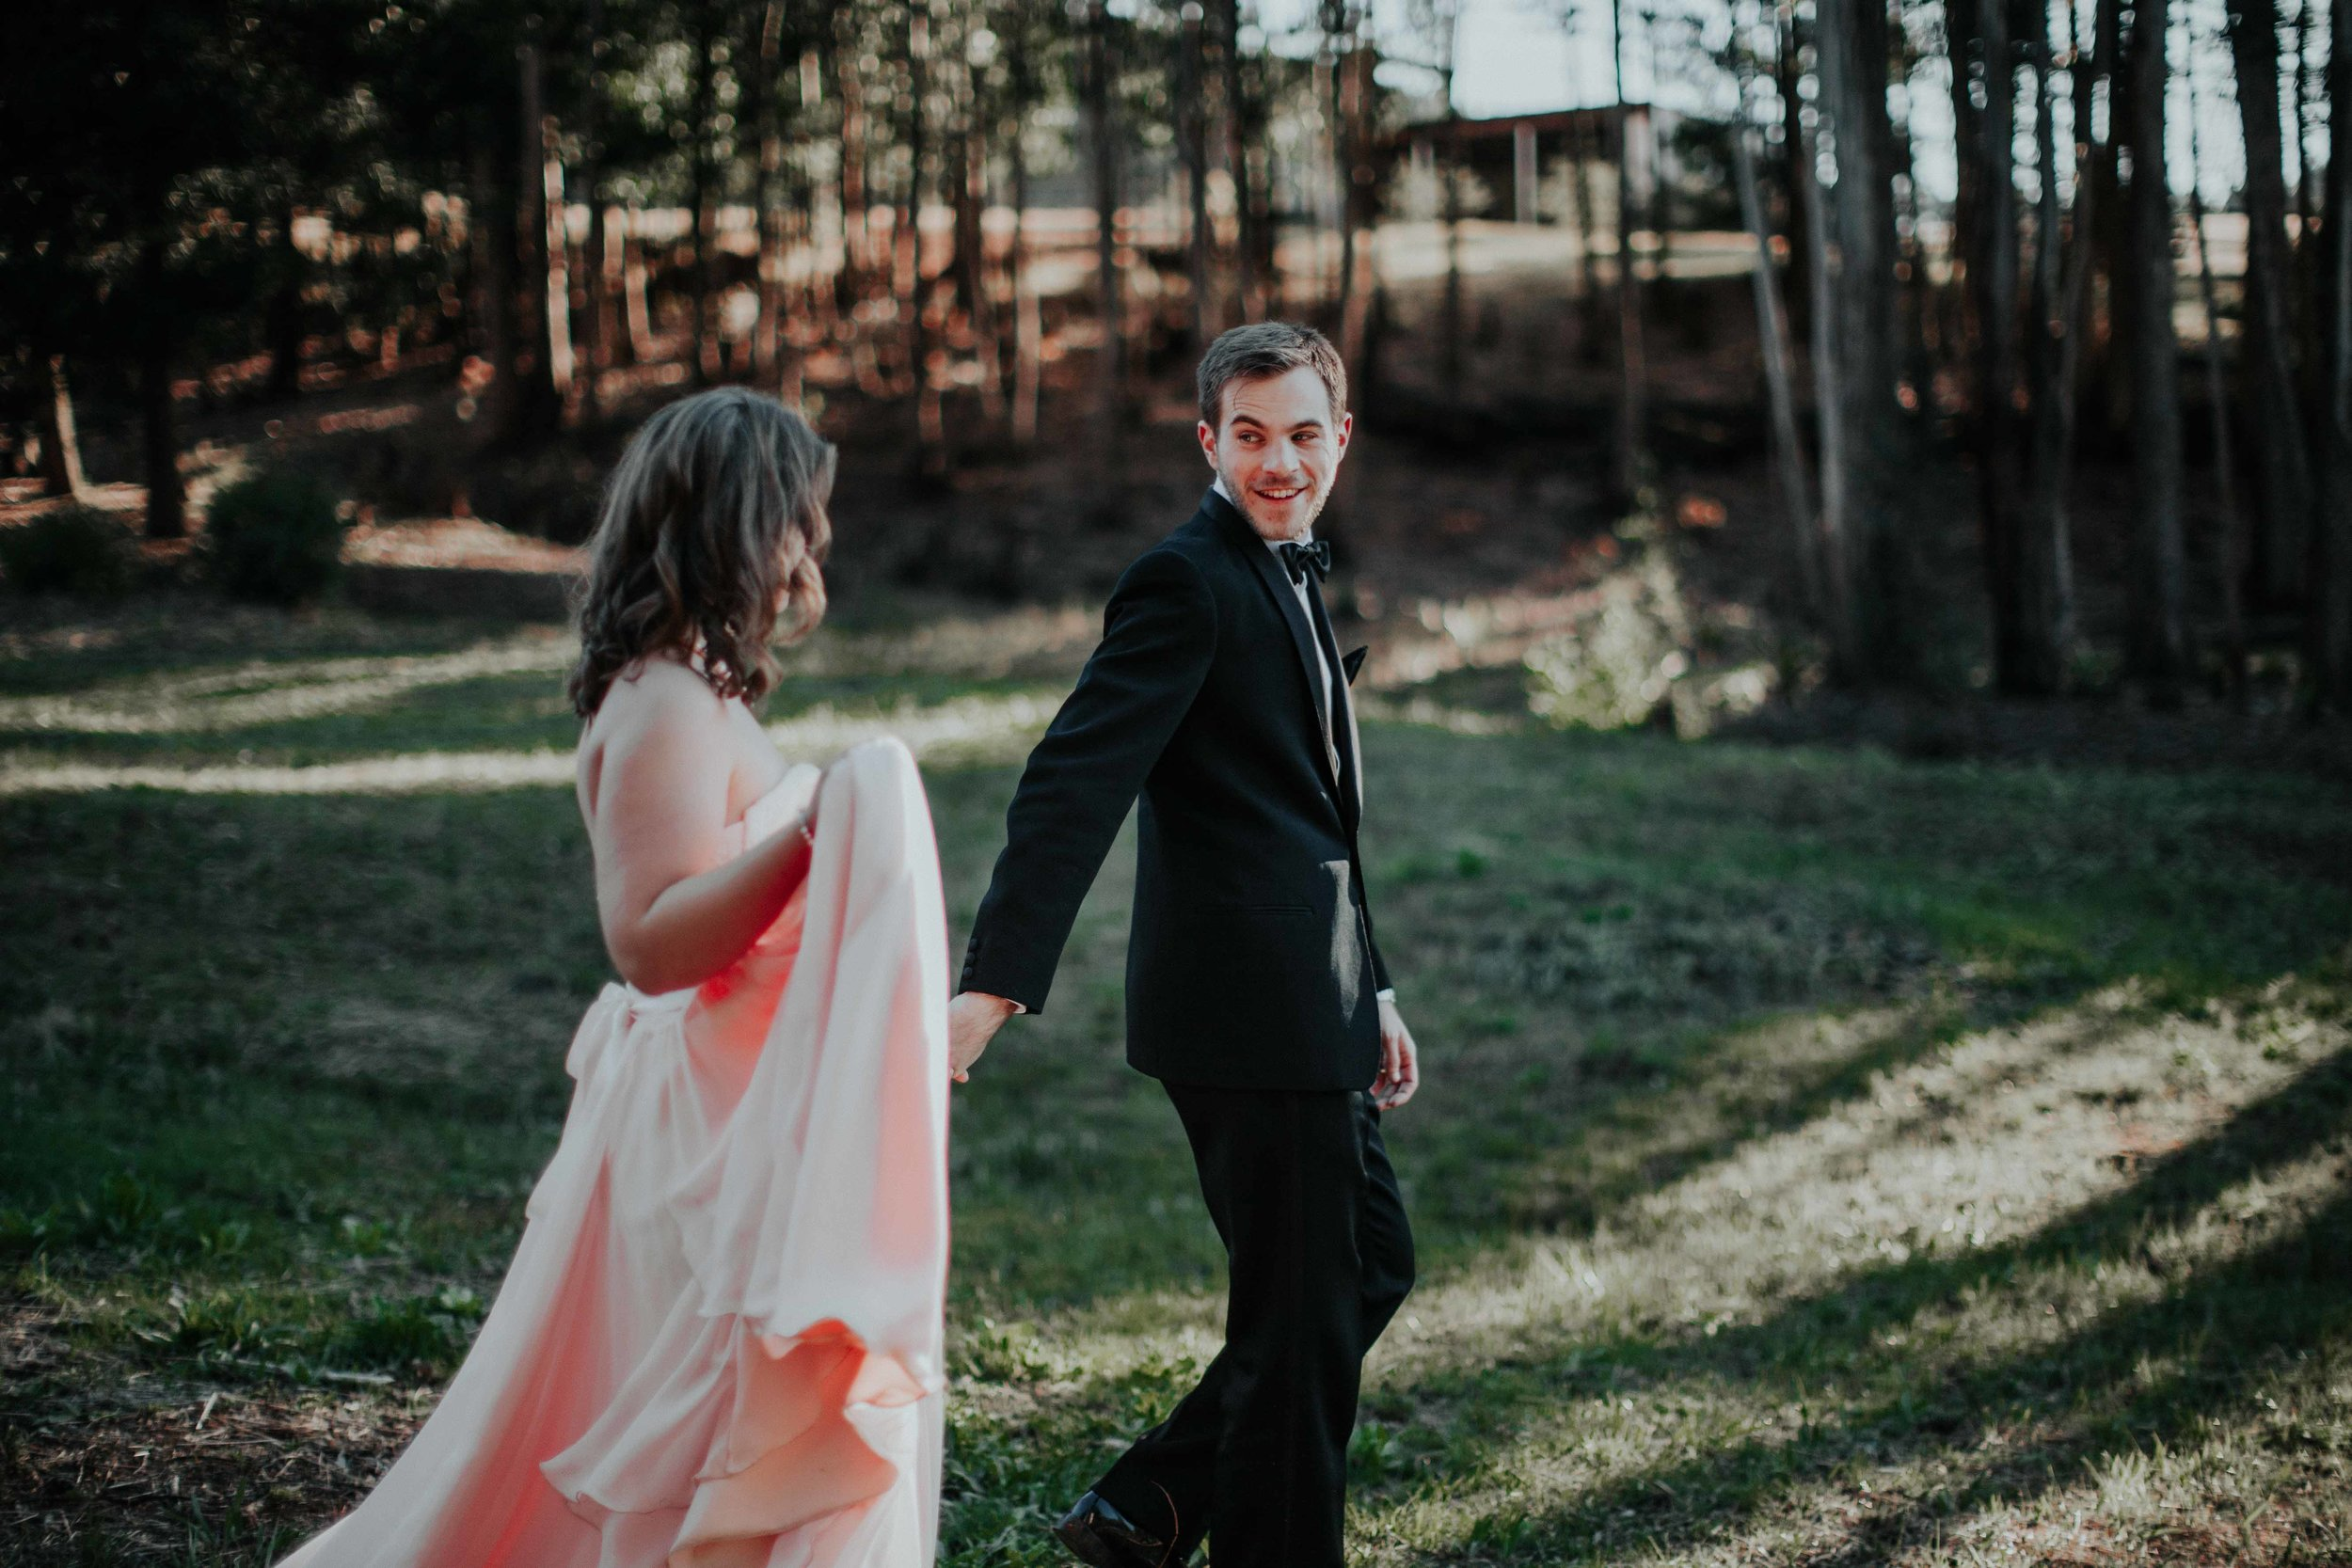 Kristi Smith Photography - Wedding Photography - Darryl & Meg 23.jpg